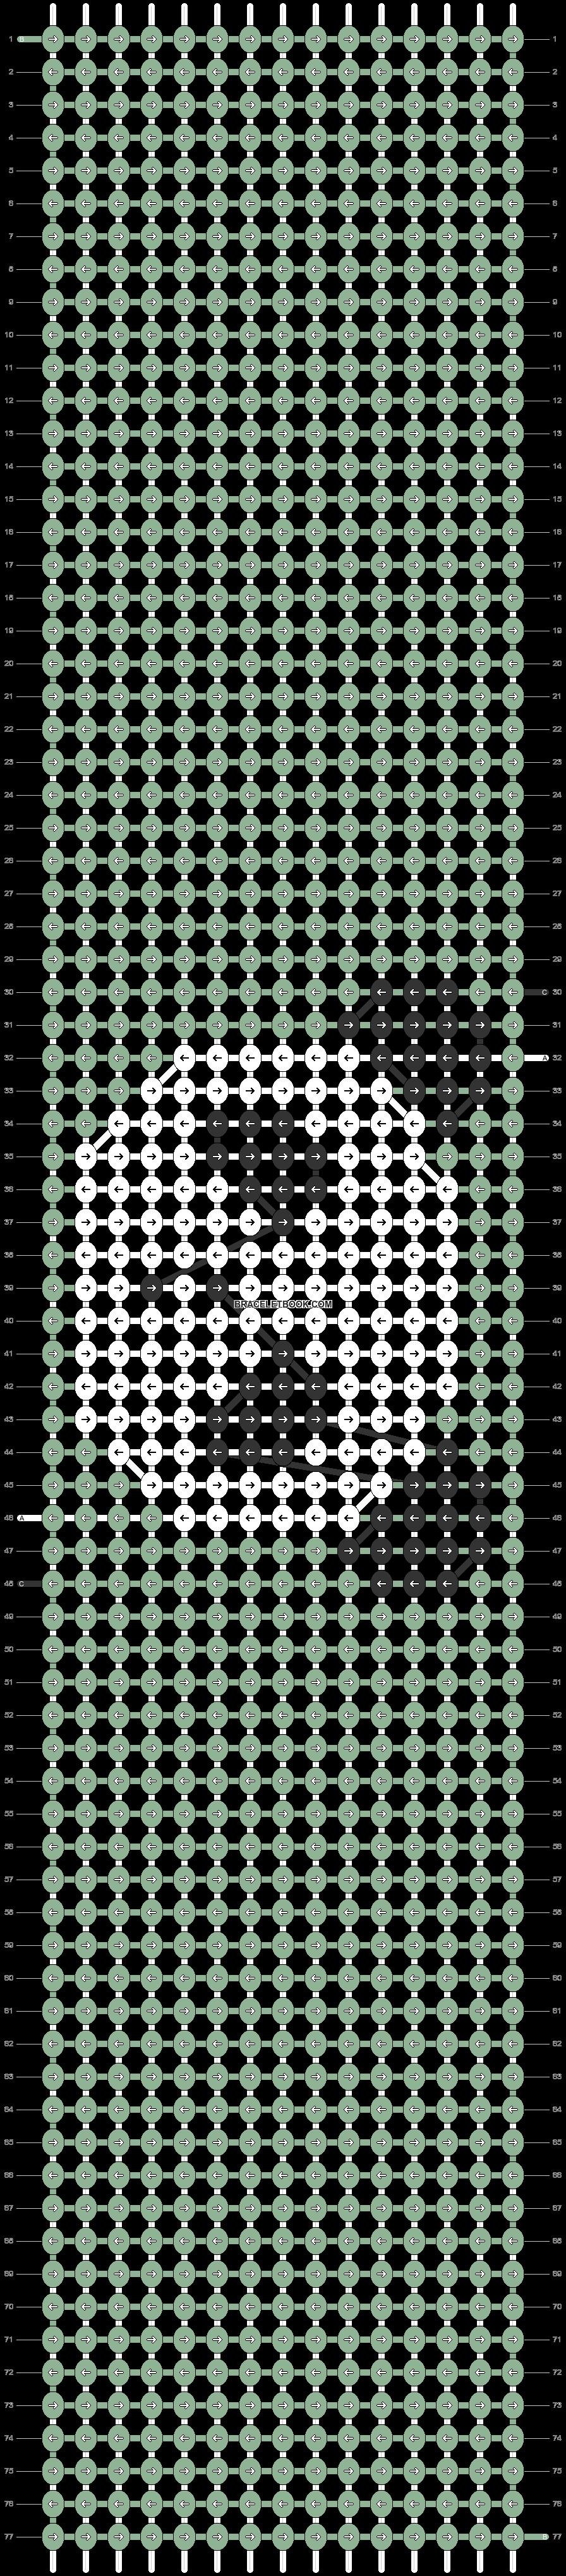 Alpha pattern #54555 pattern